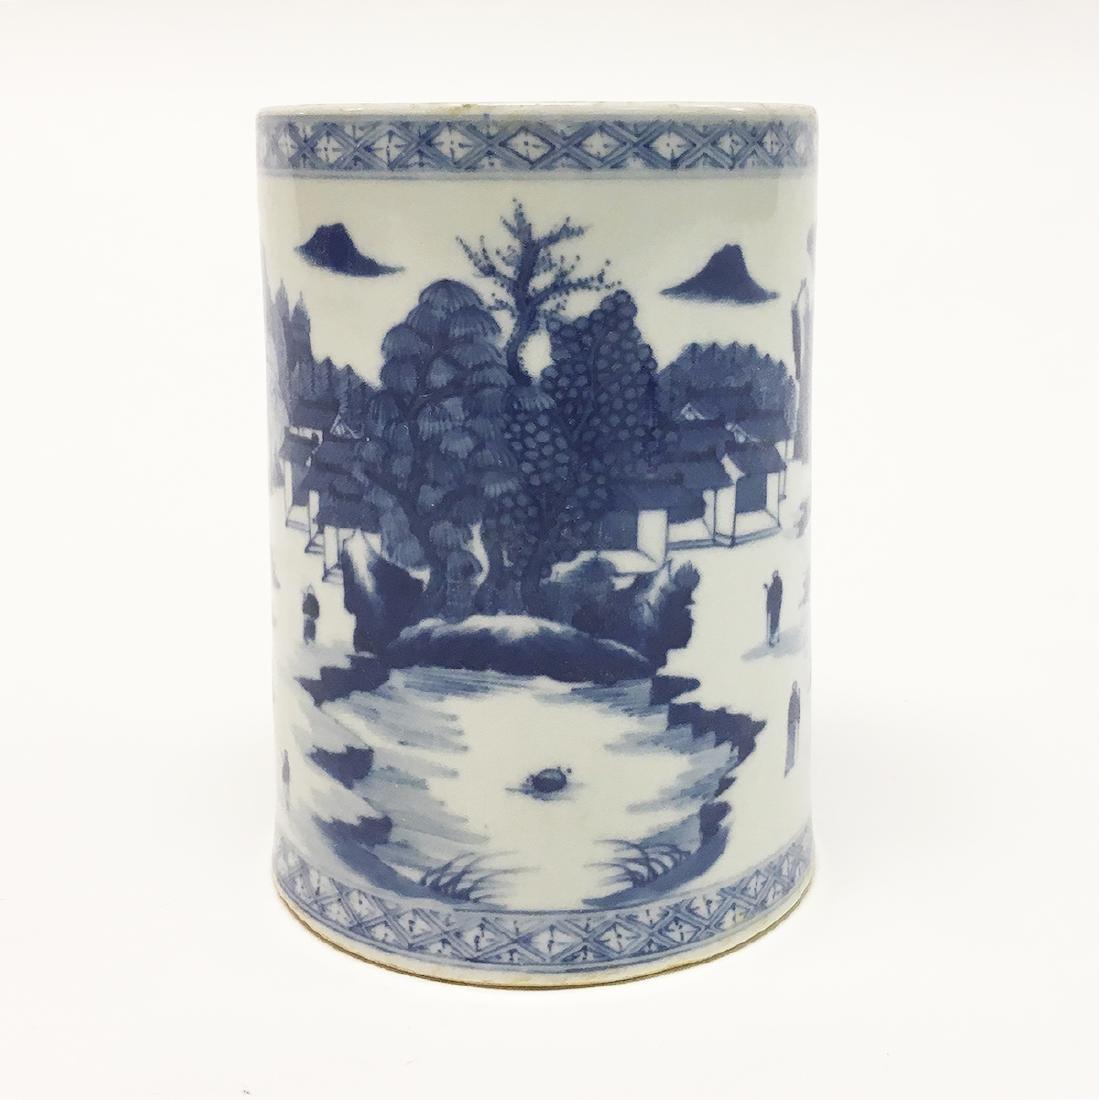 Chinese Blue and White Porcelain Brush-Pot - 2